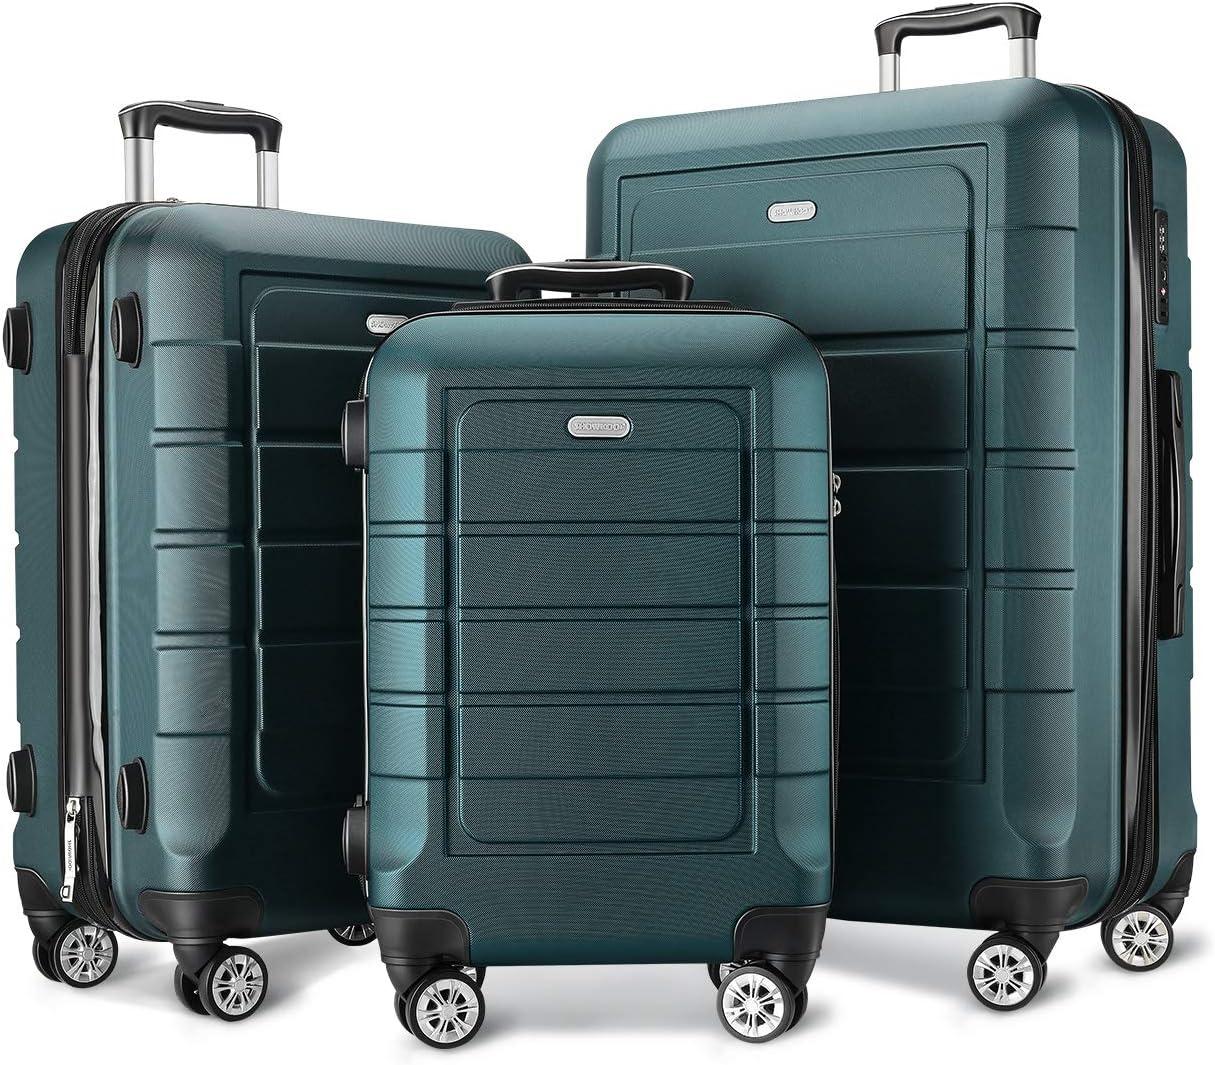 SHOWKOO Luggage Sets Double Wheels